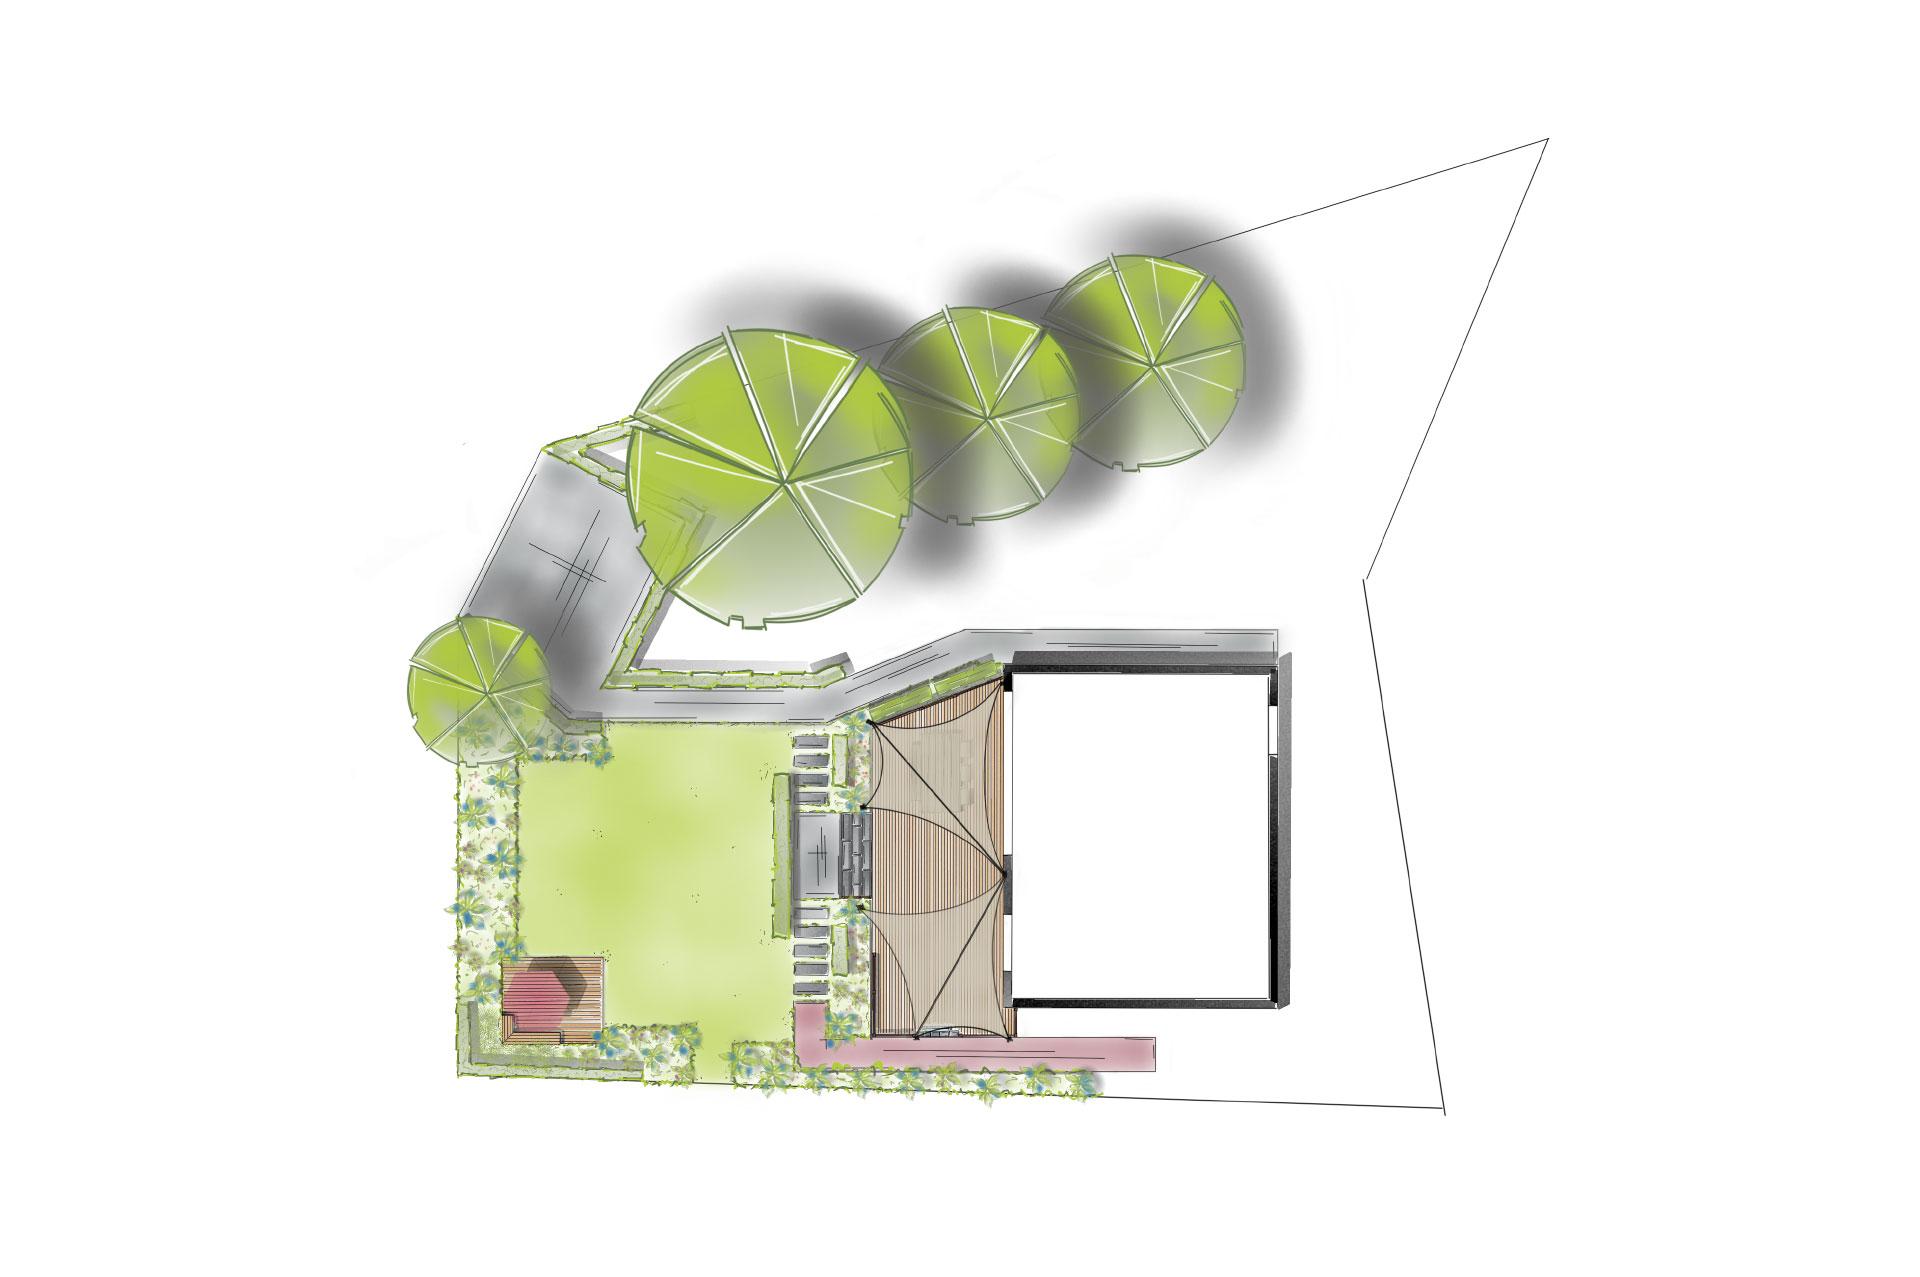 3raumPlaner Entwurfspläne